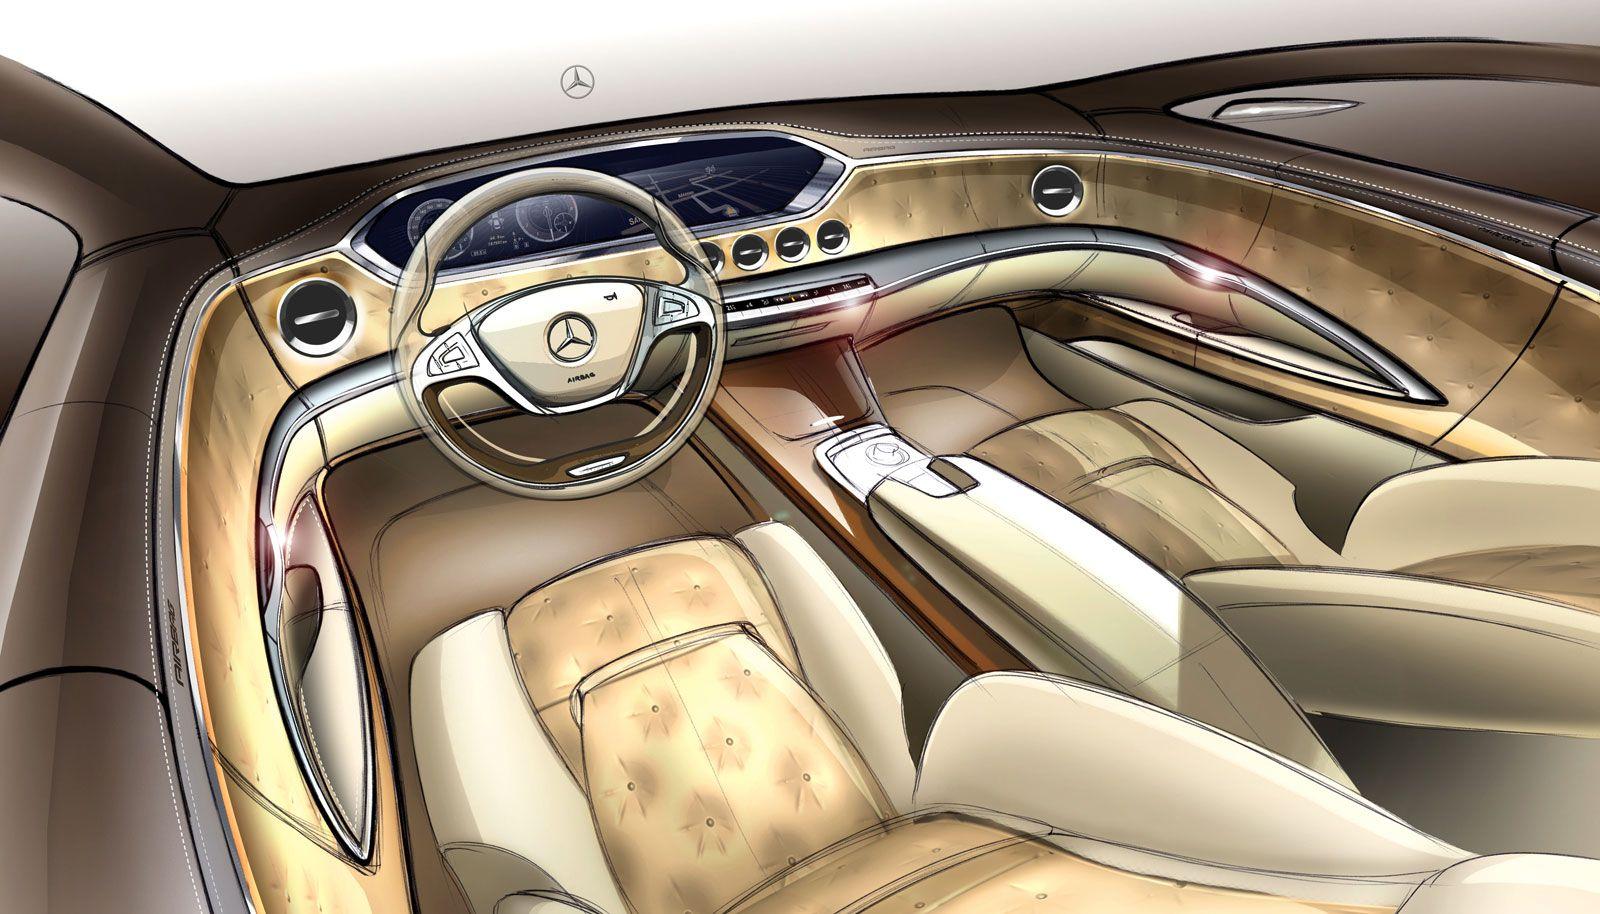 2014 Mercedes Benz S Class Interior Design Sketch Benz S Benz S Class Mercedes S Class